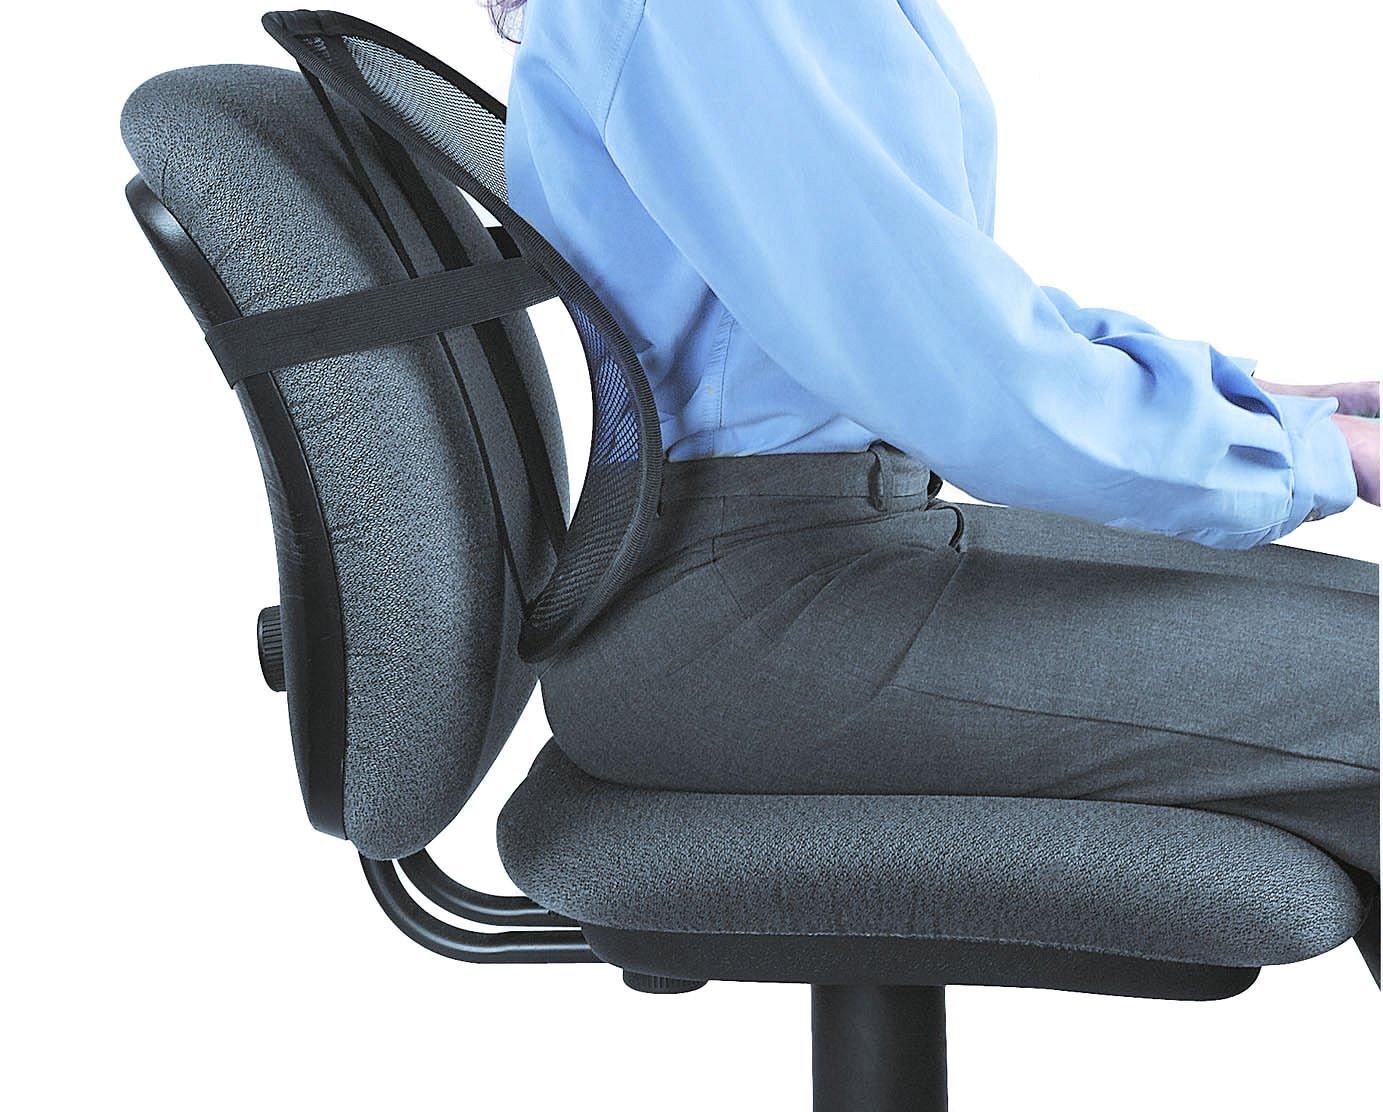 Descriere Suport ergonomic pentru spate, FELLOWES Mesh